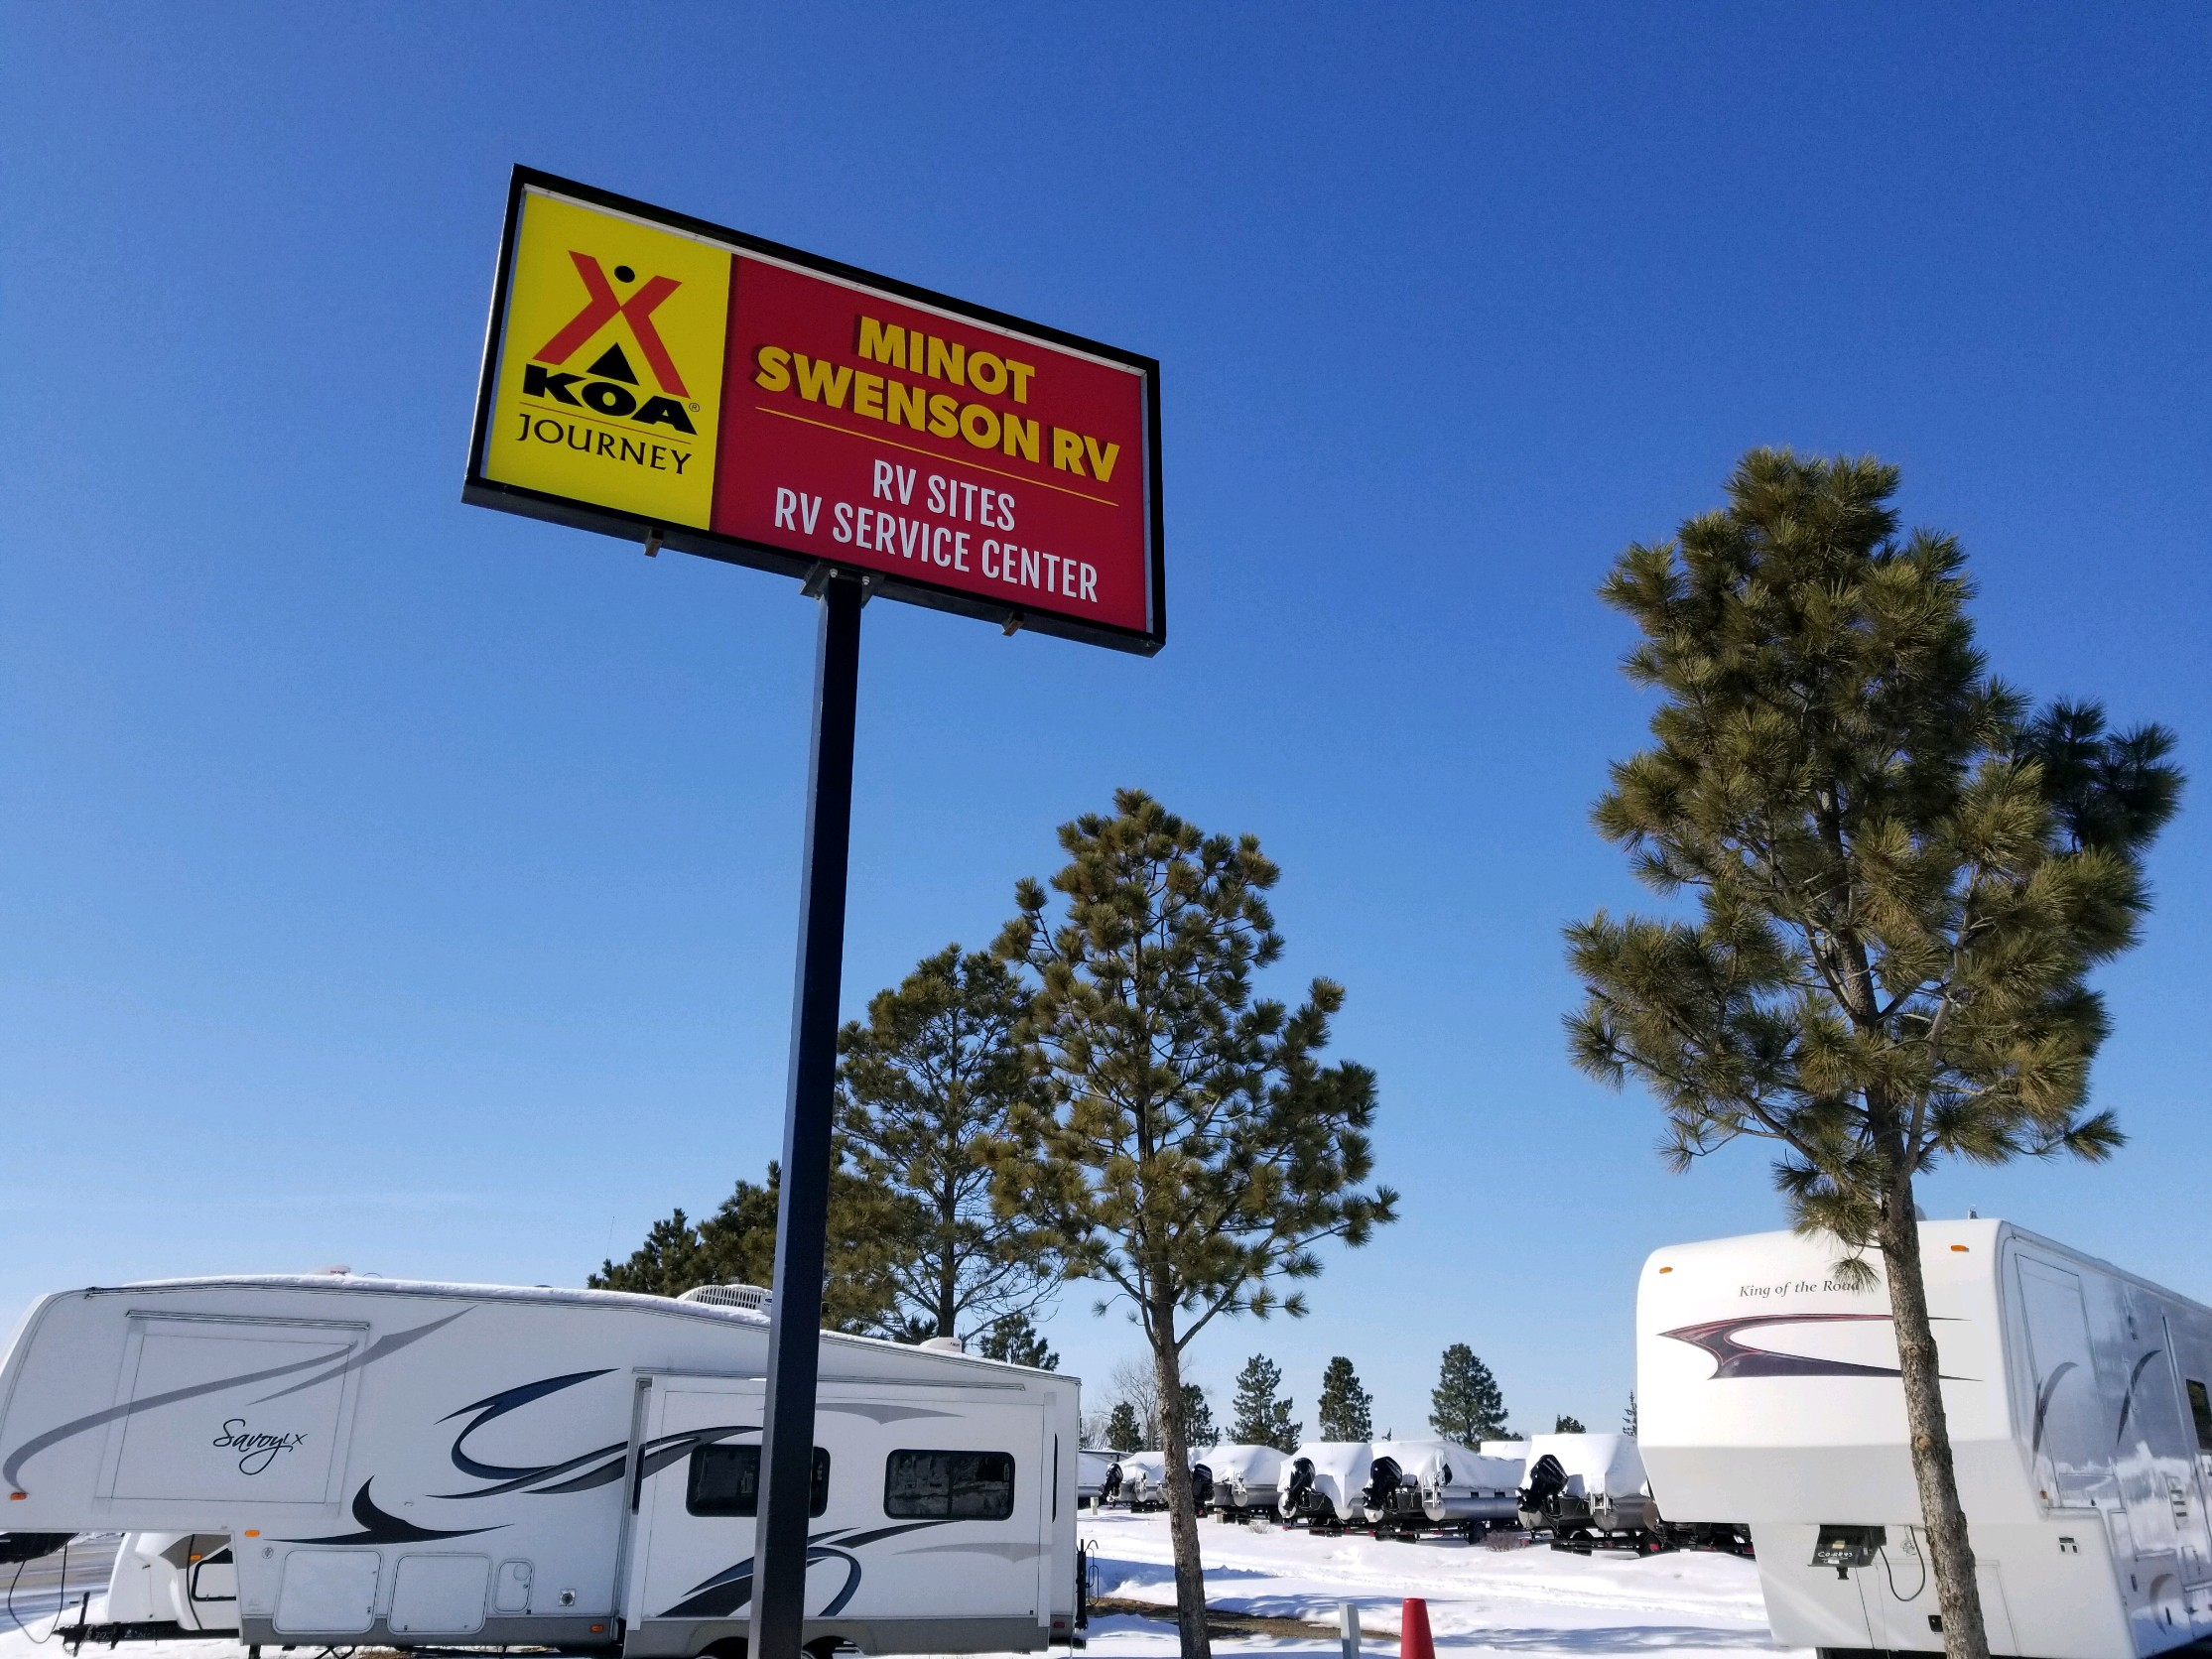 Minot North Dakota Rv Camping Sites Minot Swenson Rv Koa